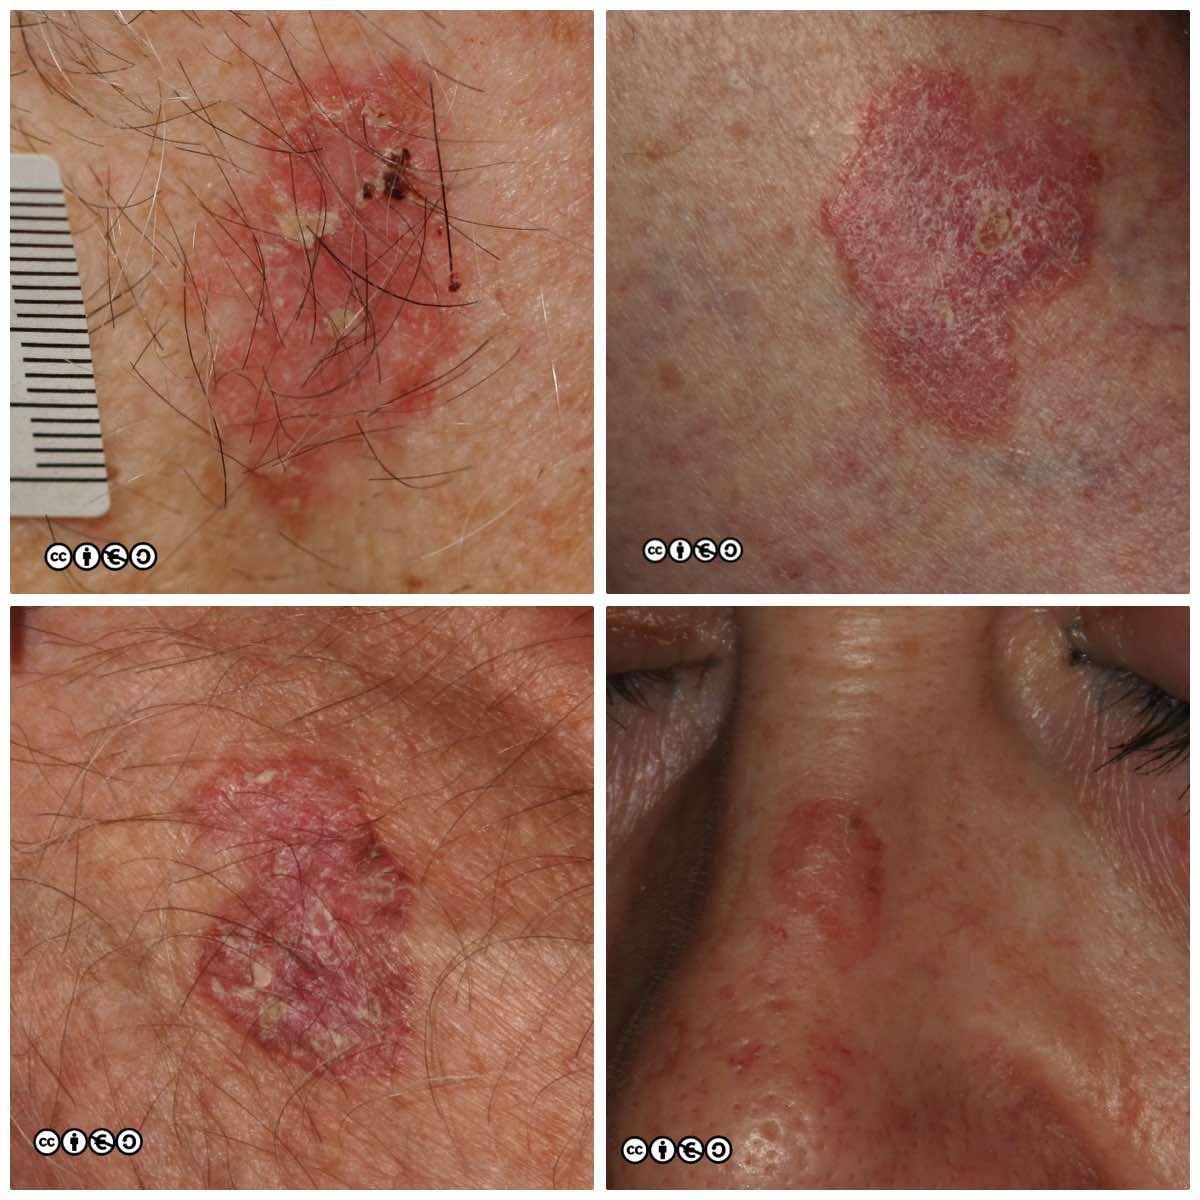 Premalignant lesions - Skin Cancer 909